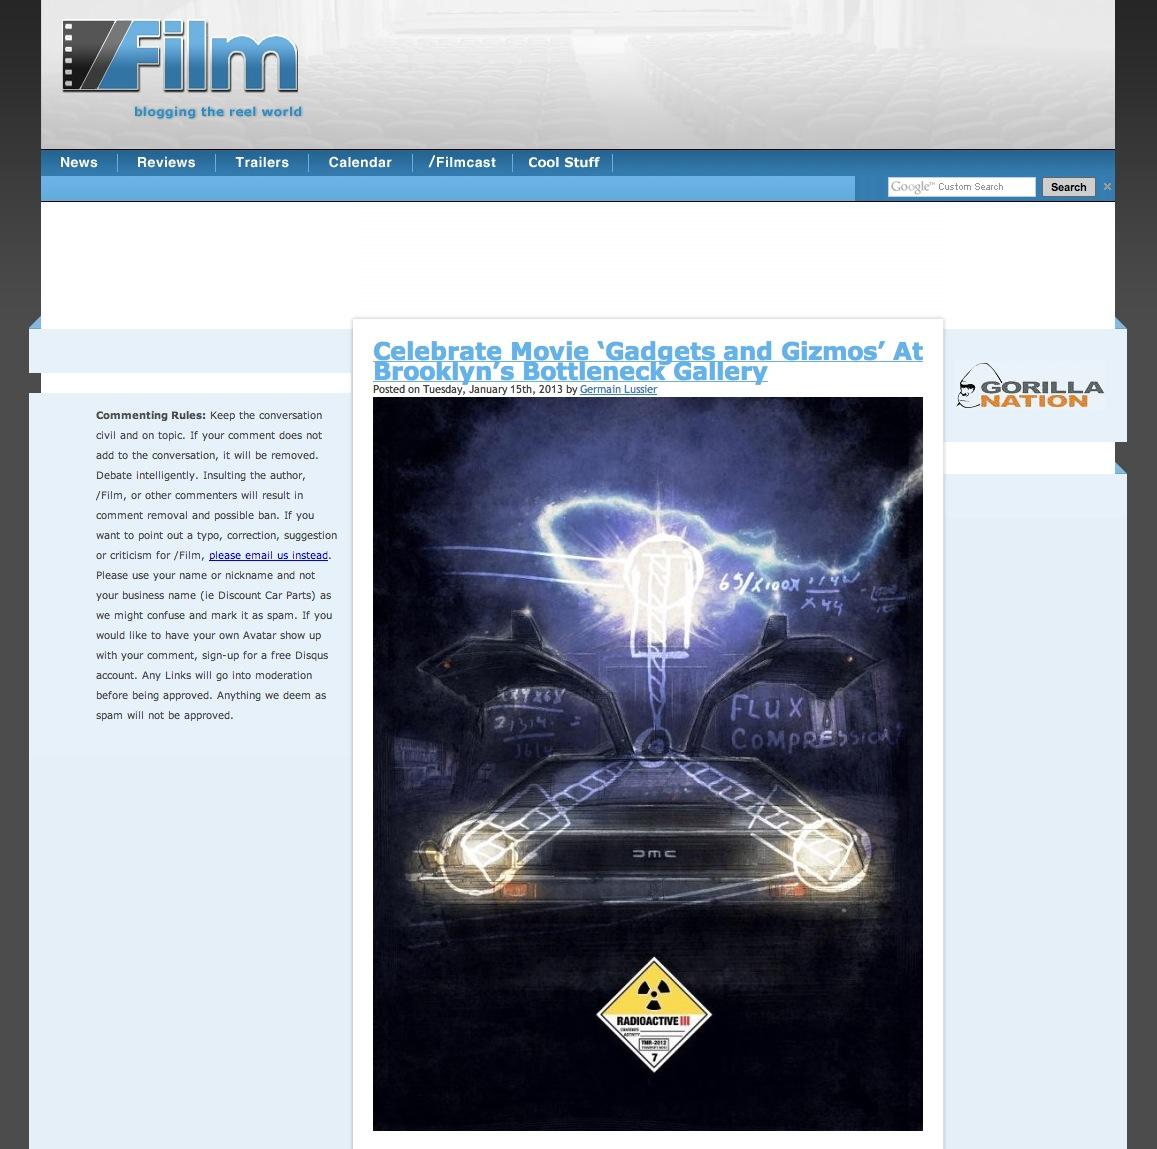 Back to the Future - Slash Film